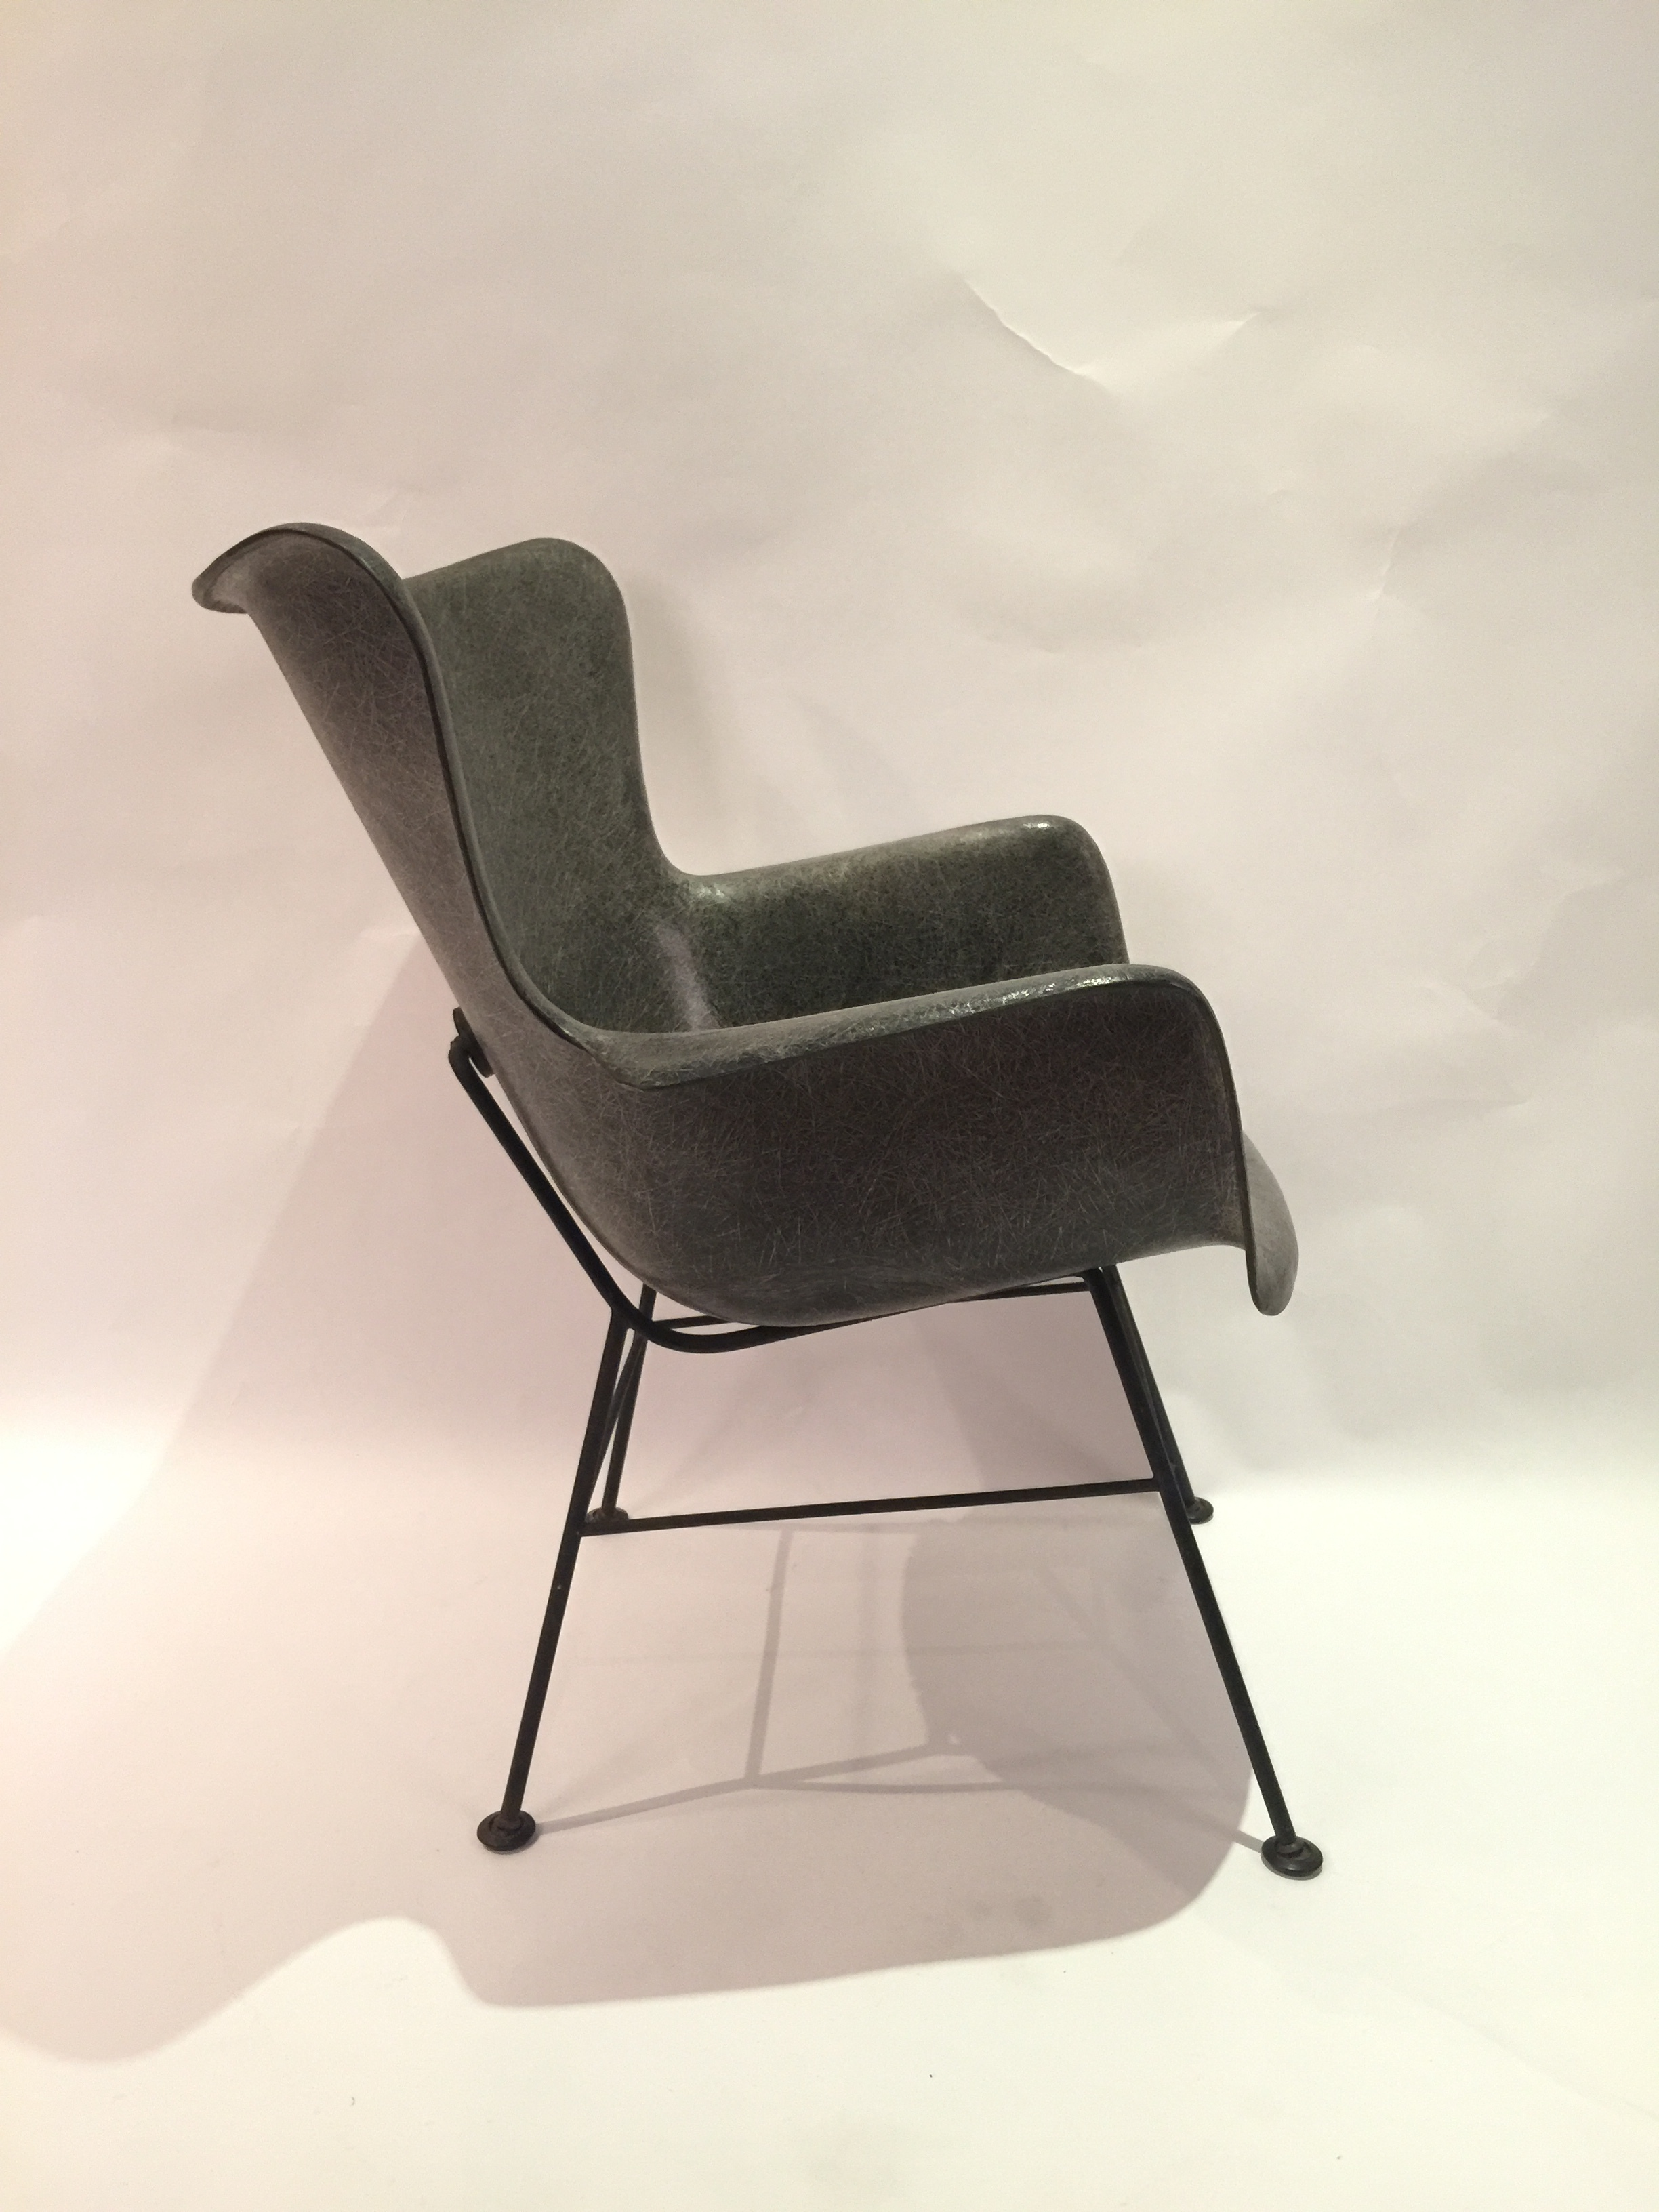 Laurence Peabody for Selig - Wingback chair.JPG